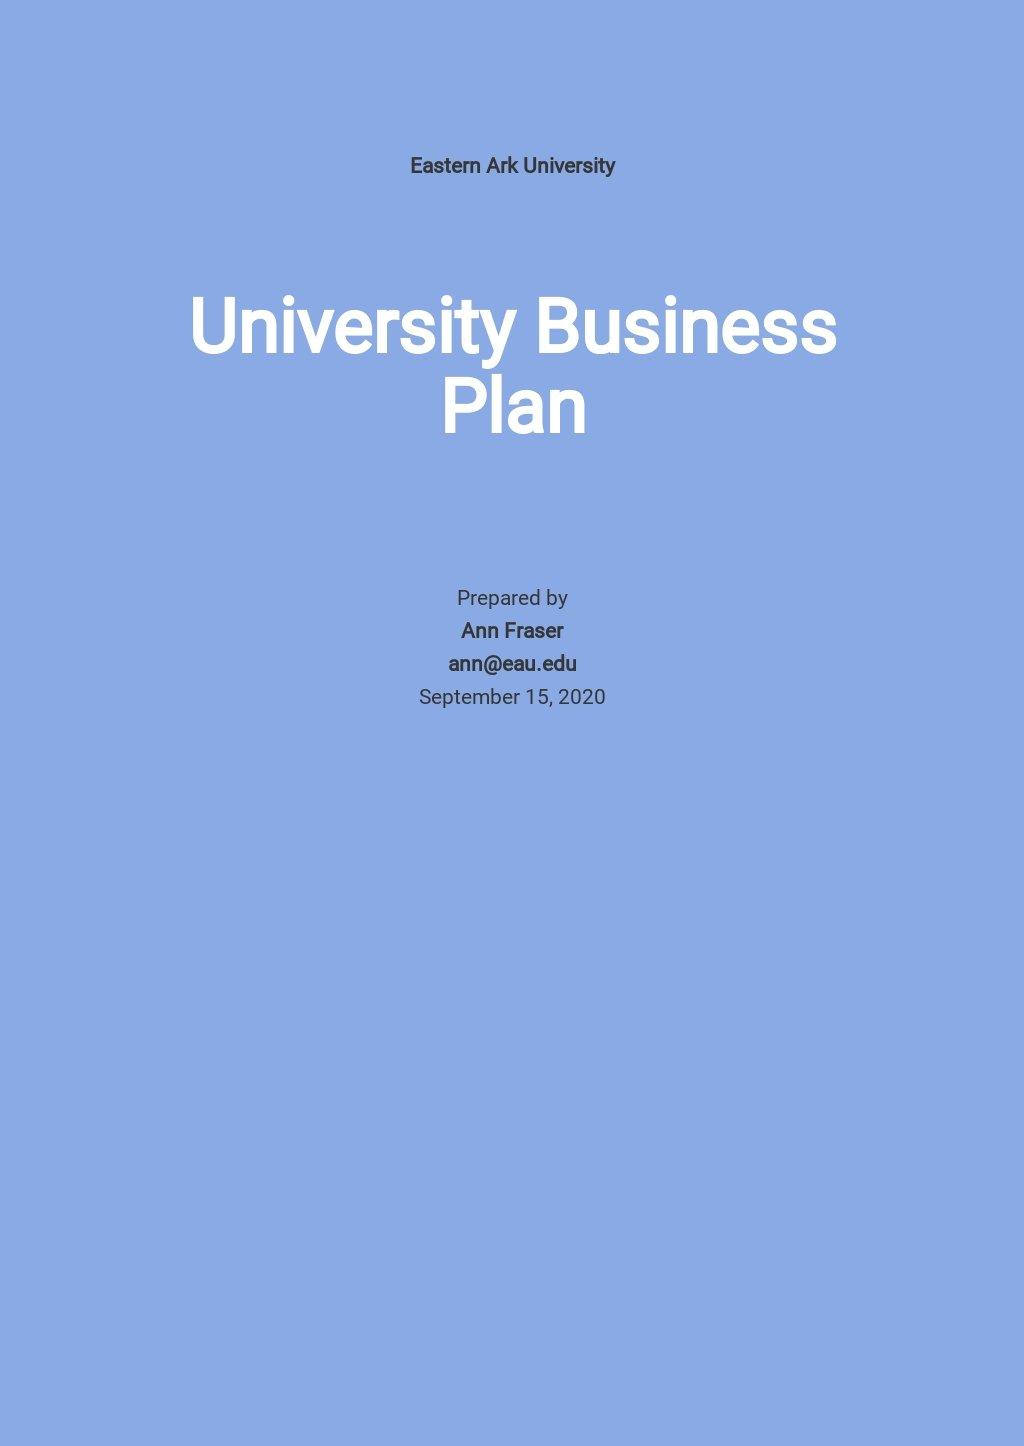 Free Blank University Business Plan Template.jpe